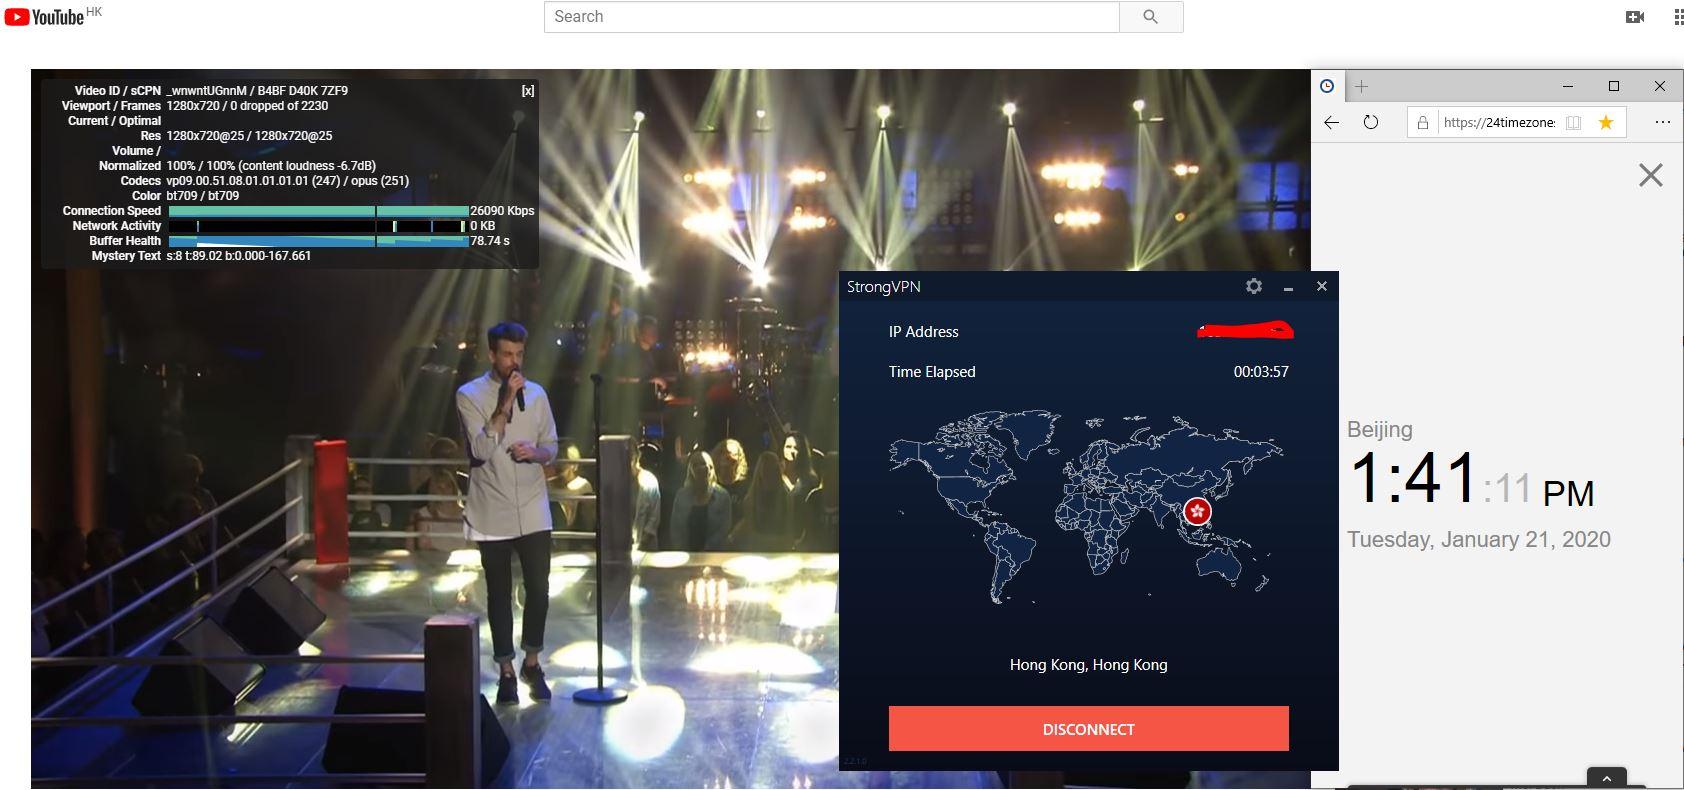 Windows10 StrongVPN Hong Kong 中国VPN翻墙 科学上网 Youtube测速-20200121